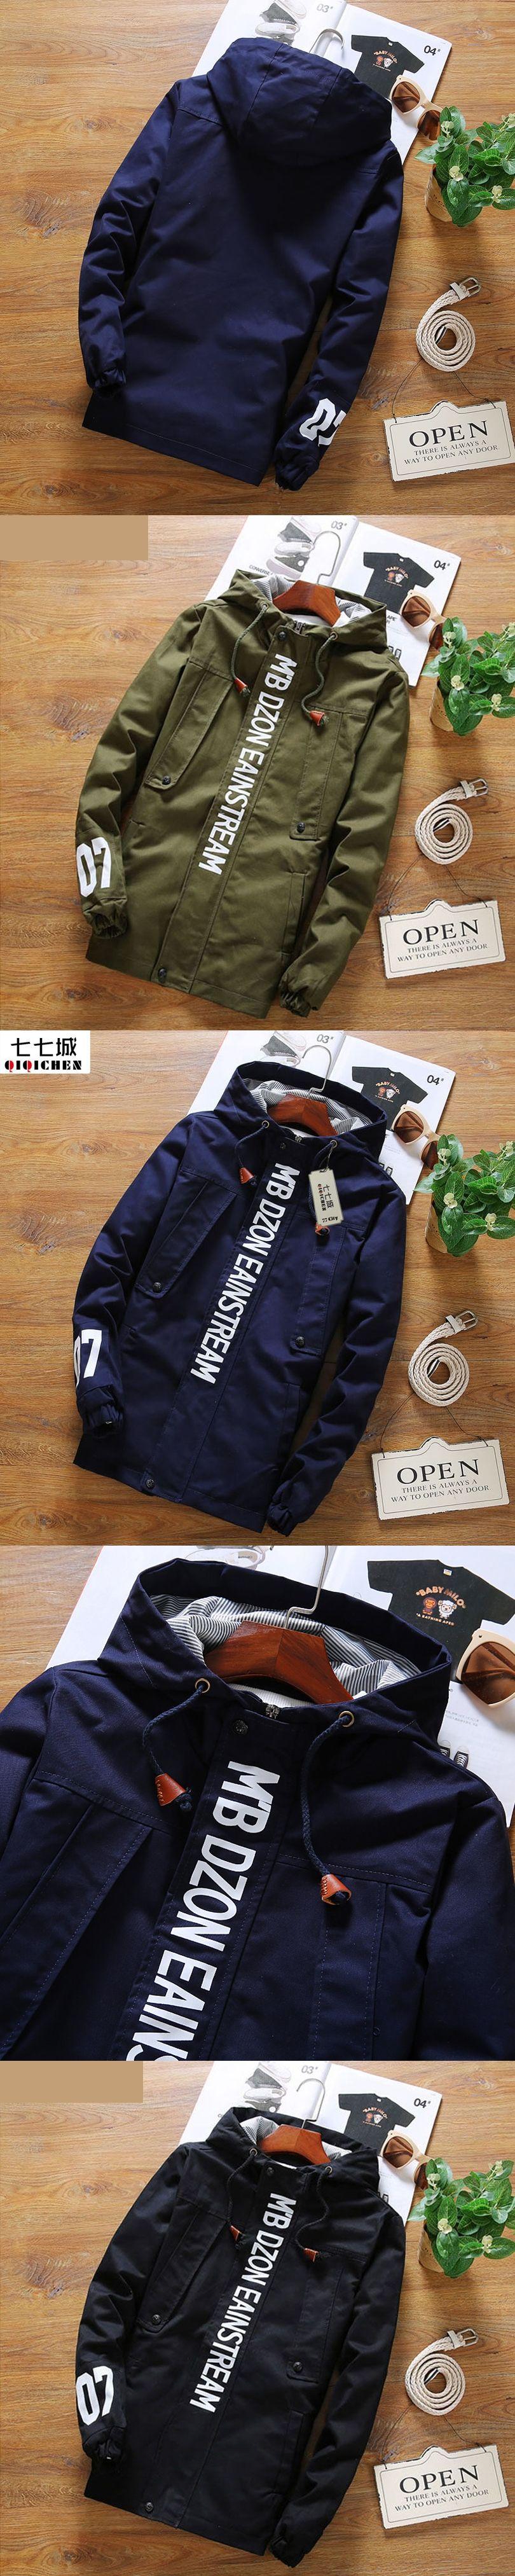 499dbc641d9 Army Jacket Men Hooded Jacket Male Letter Men Jacket Coats 2017 New Fashion  Causal Plus Size 5XL Zipper Men Coat 3 Colors